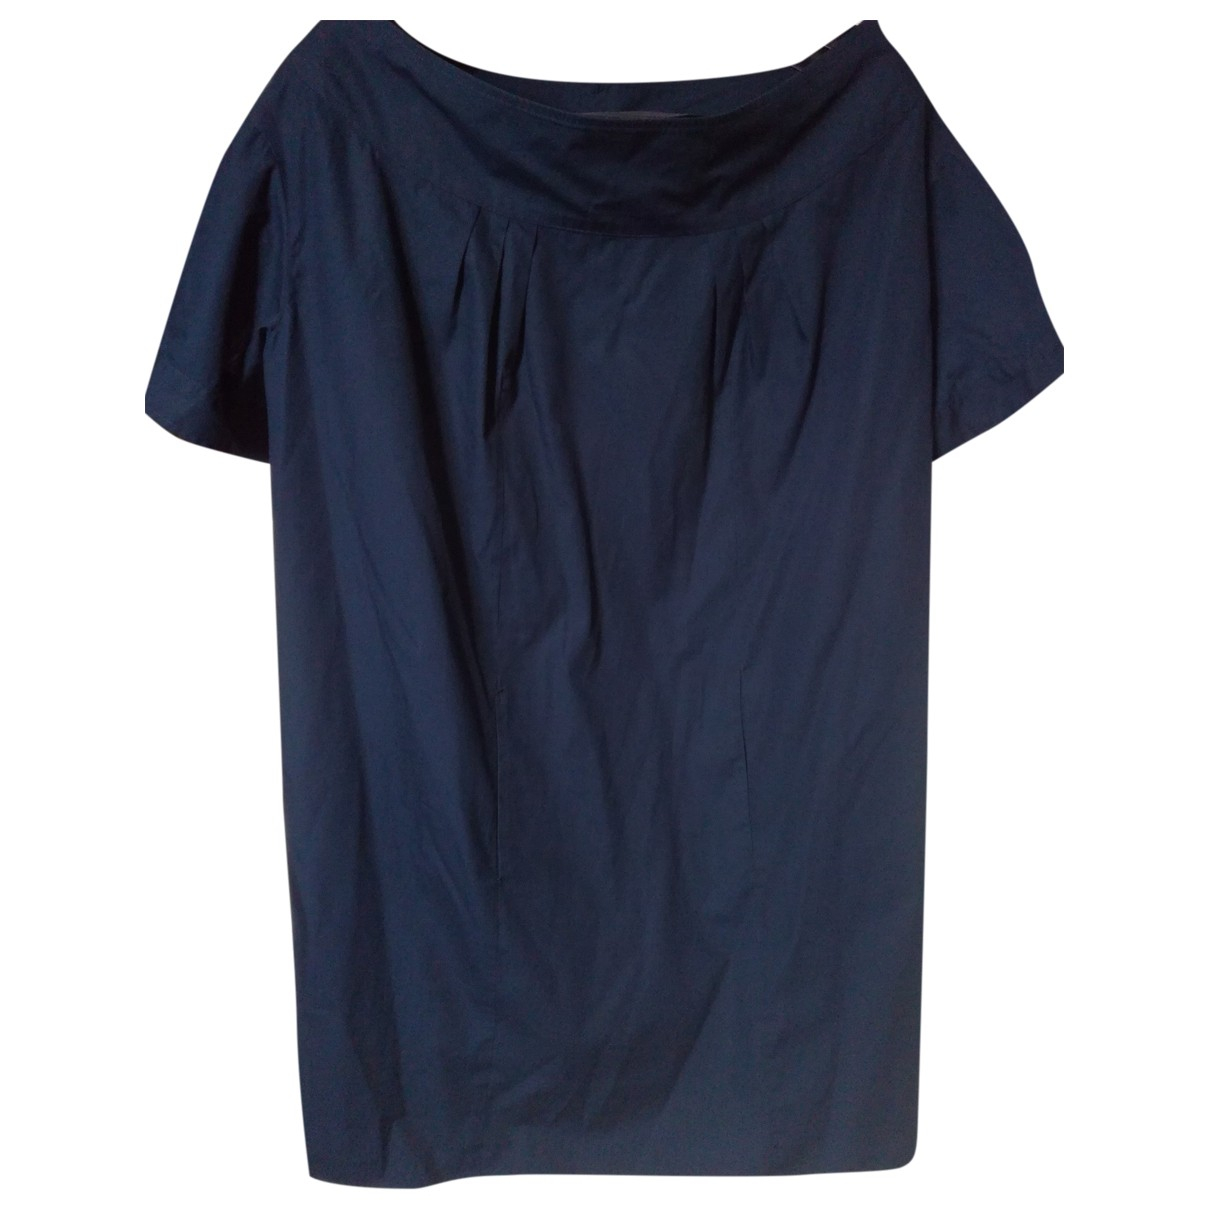 Miu Miu \N Blue Cotton dress for Women 40 IT